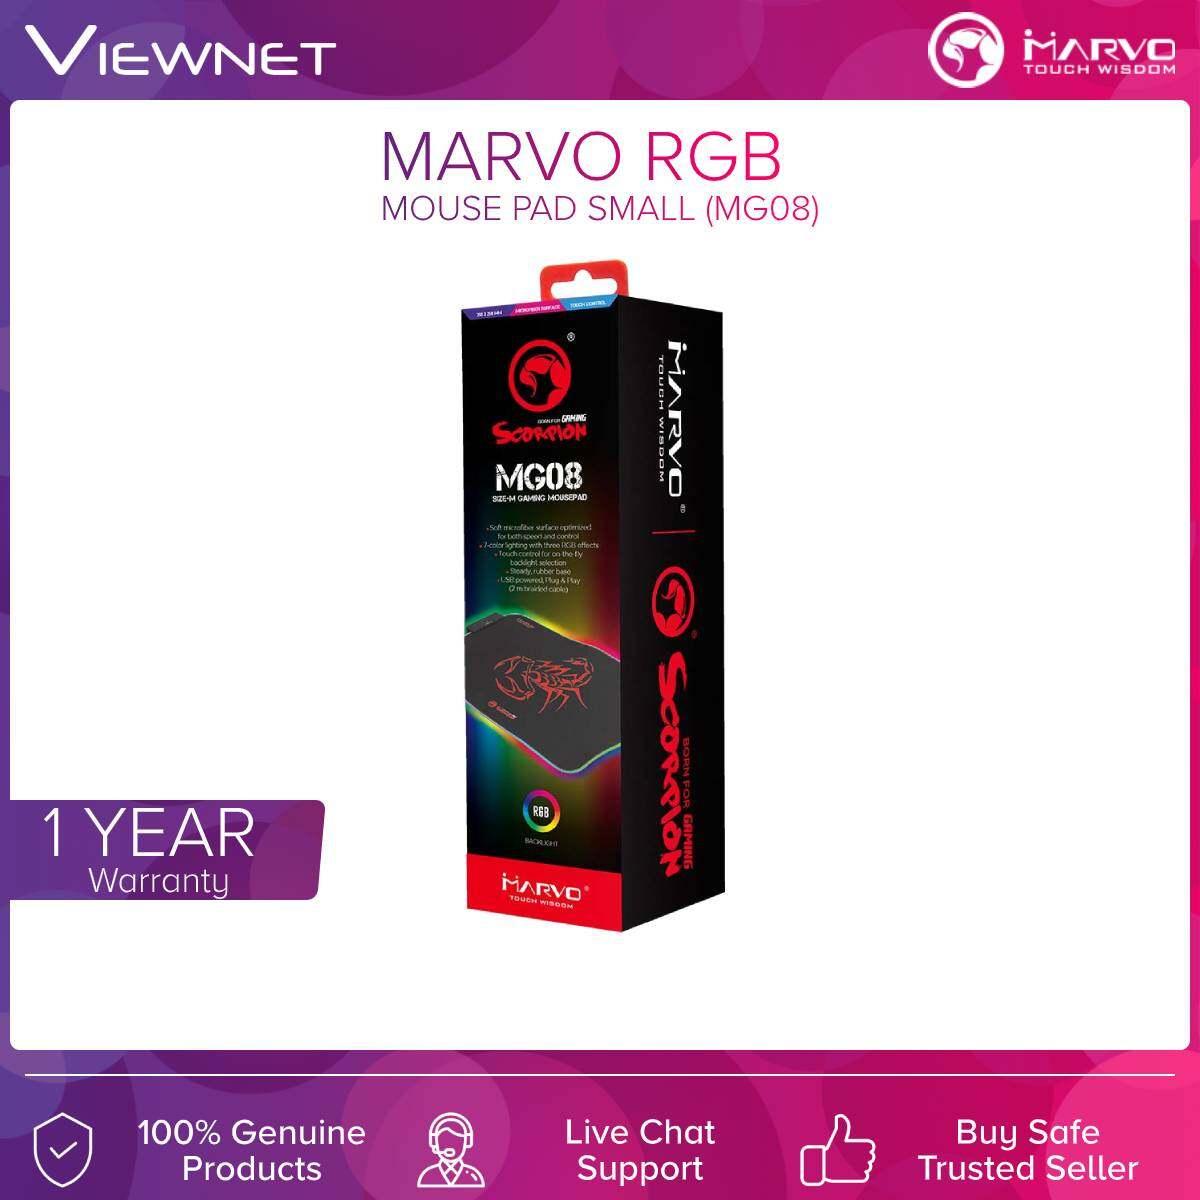 Marvo (MG08) RGB Mouse Pad small